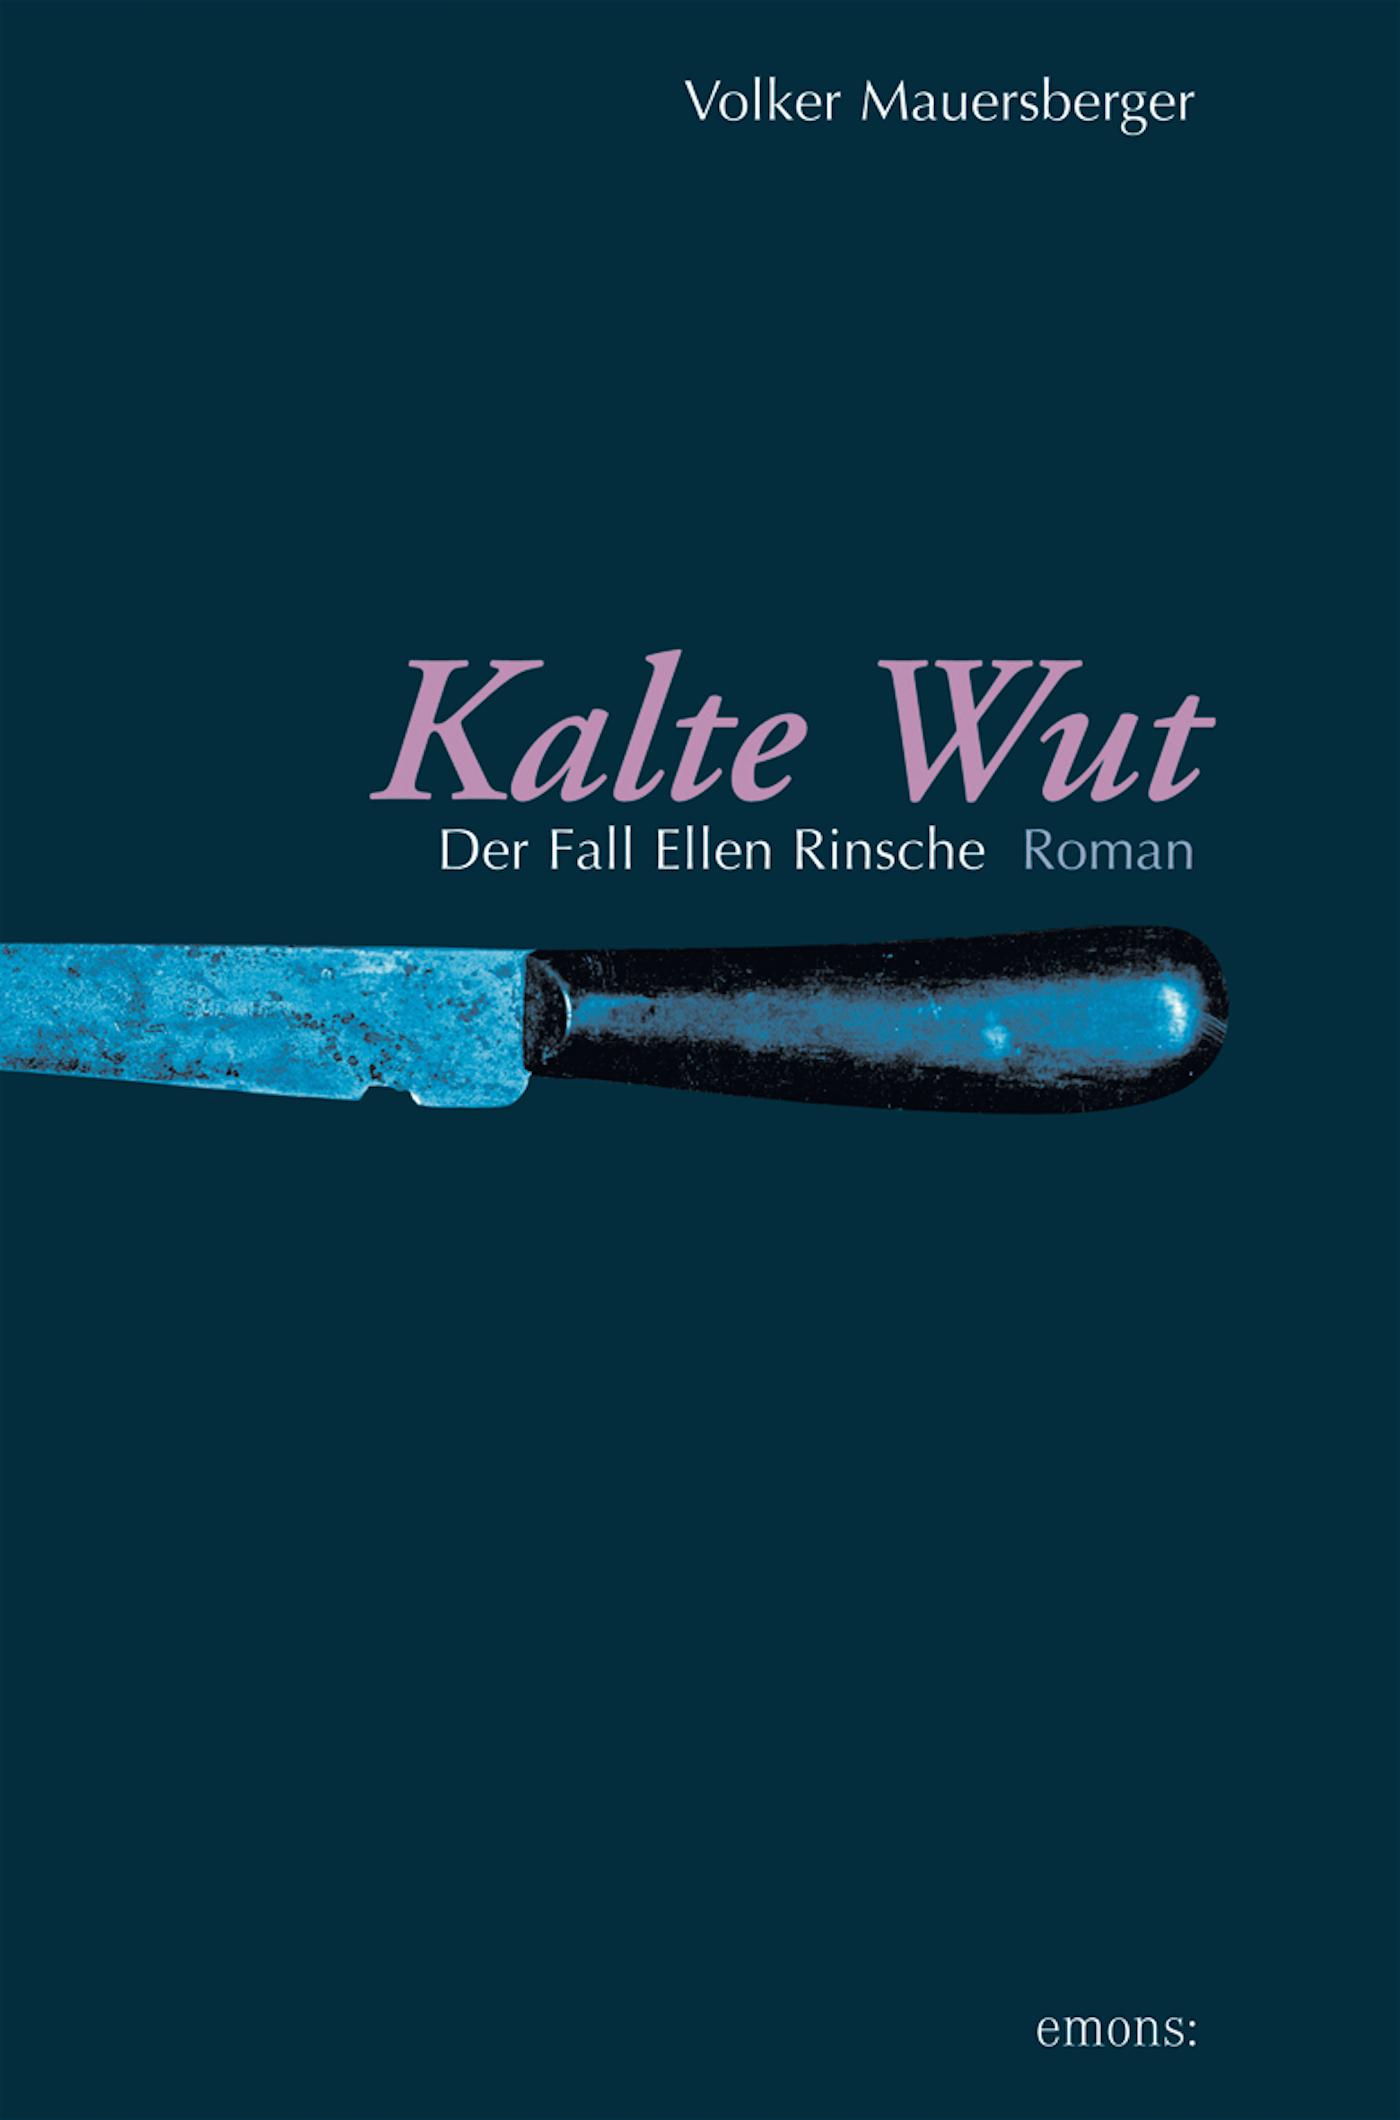 цена Volker Mauersberger Kalte Wut онлайн в 2017 году